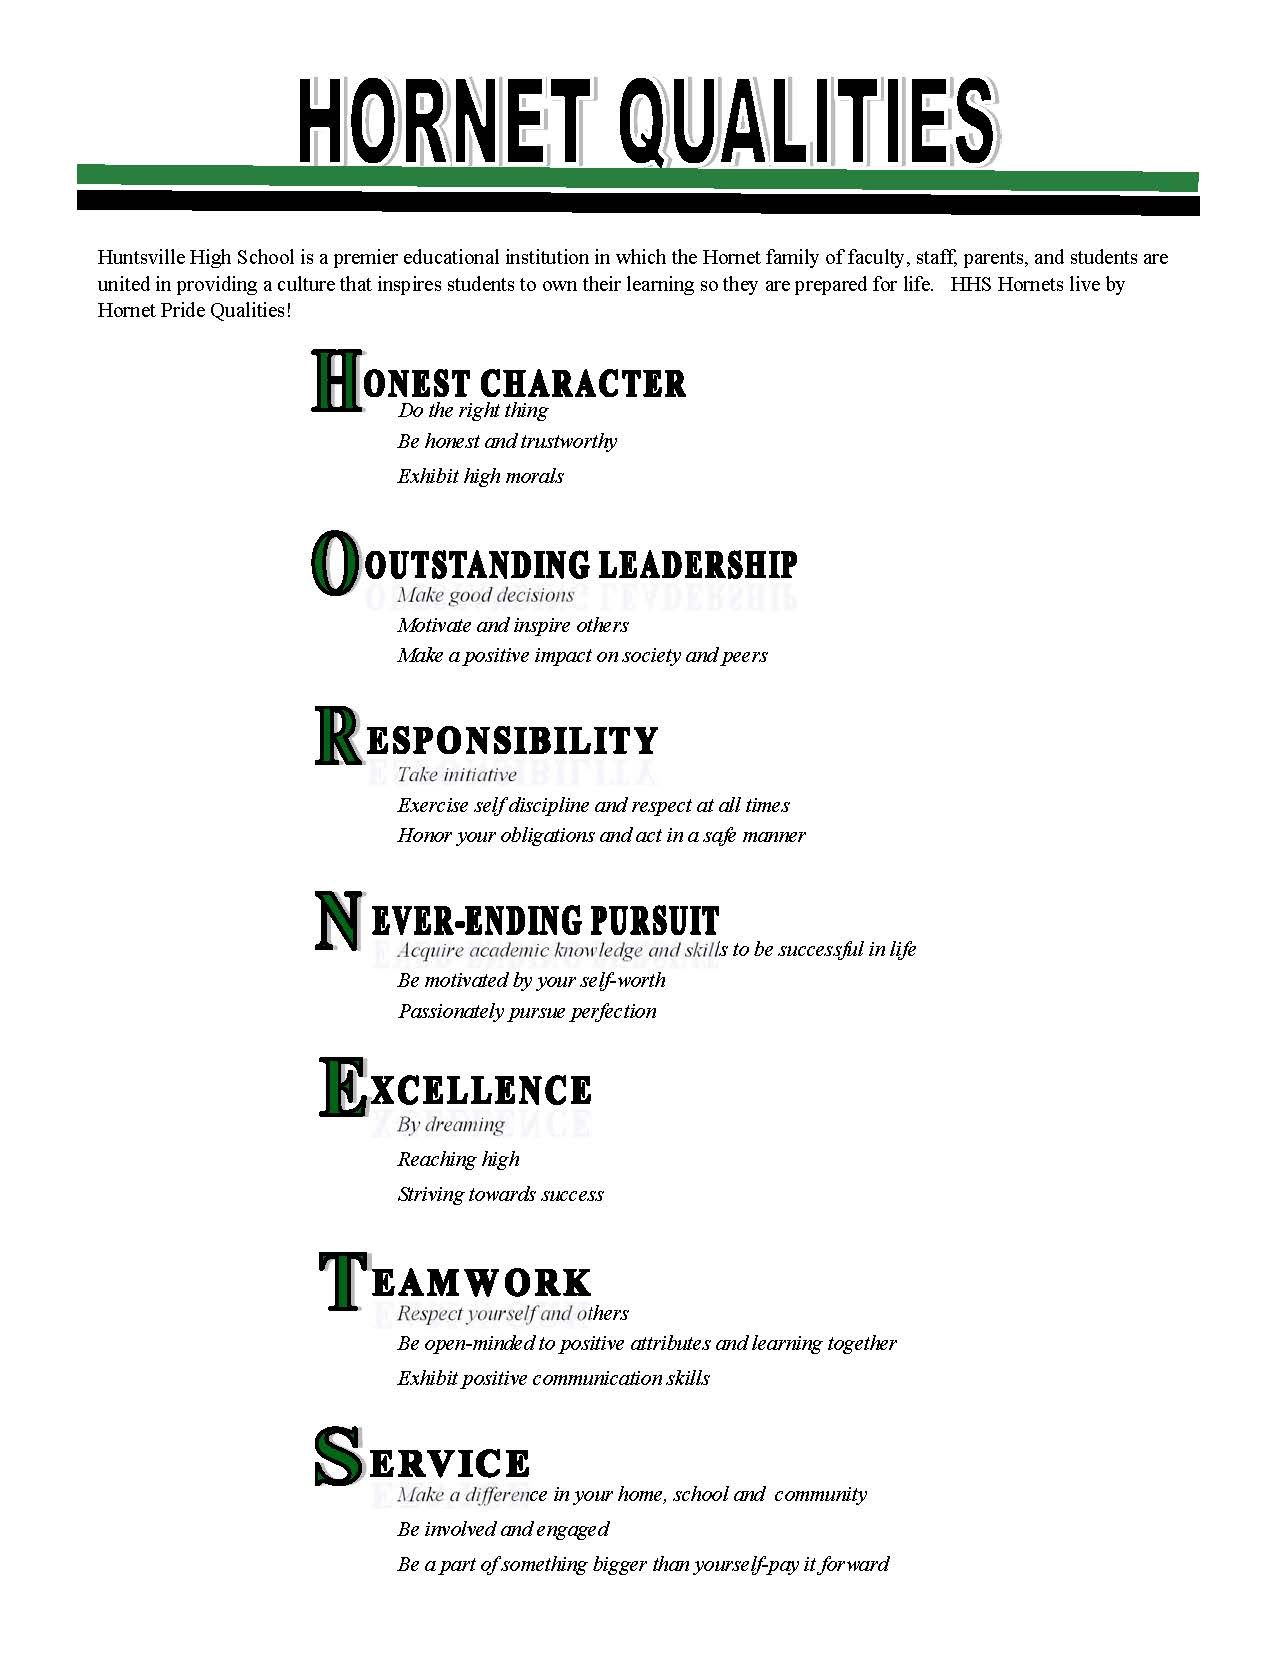 Hornet Qualities